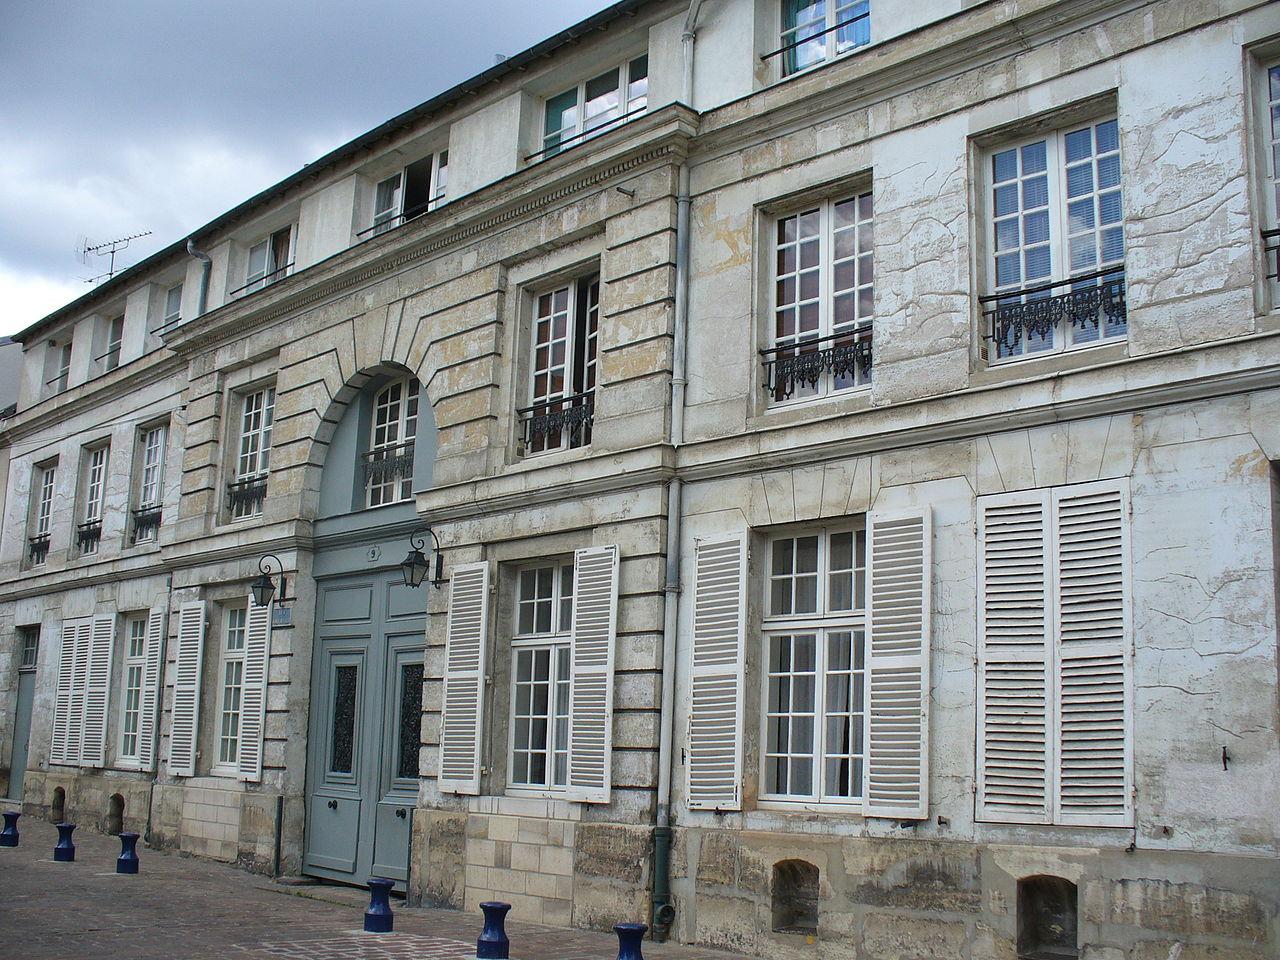 File:Maison ancienne de clamart.jpg - Wikimedia Commons